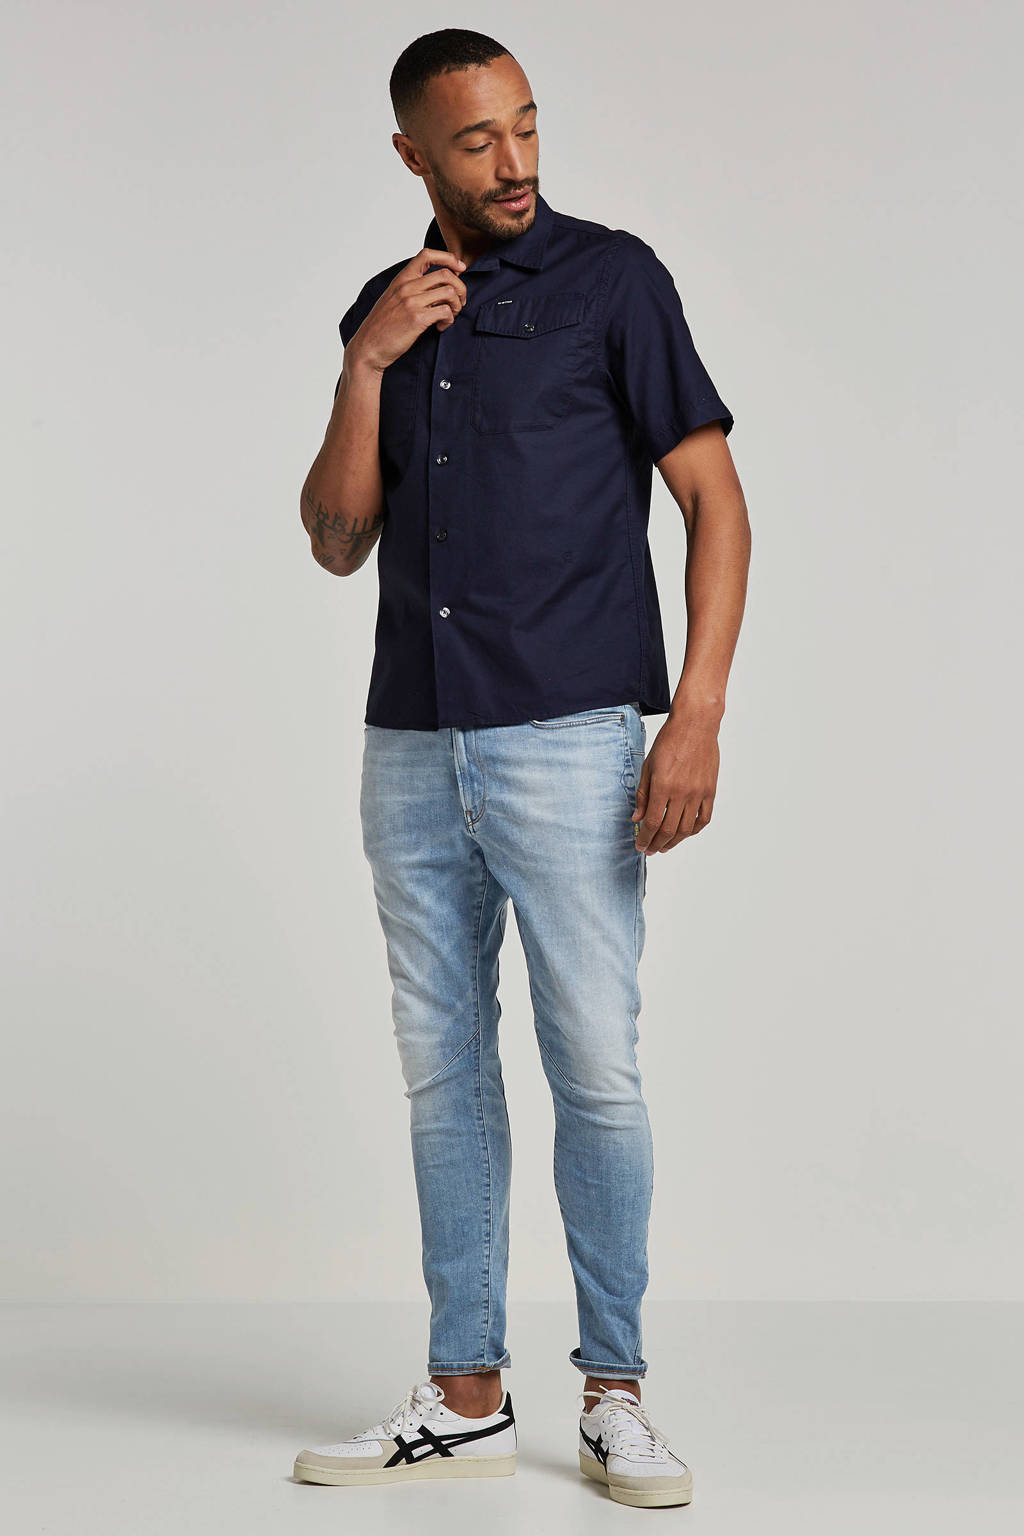 G-Star RAW overhemd korte mouw Bristum, Donkerblauw